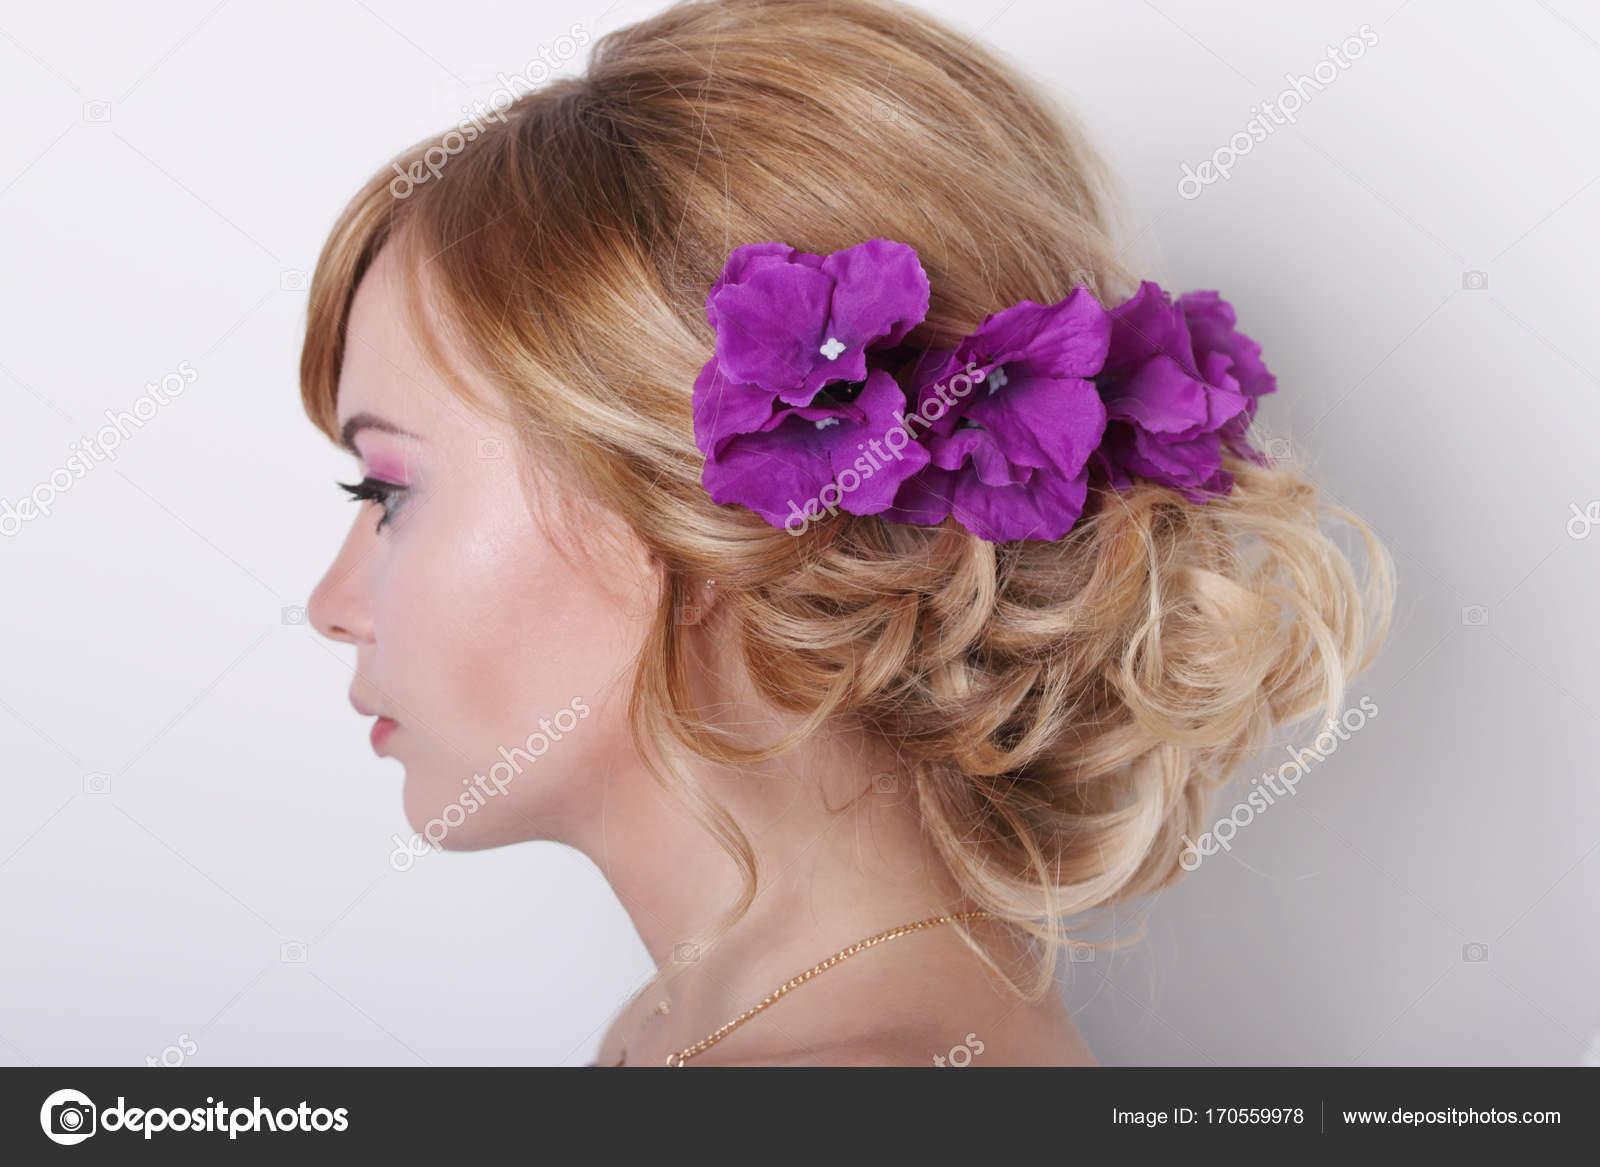 1d4f09e6ee3a Πορτρέτο στο προφίλ του όμορφη νεαρή ξανθιά γυναίκα με λουλούδια —  Φωτογραφία Αρχείου